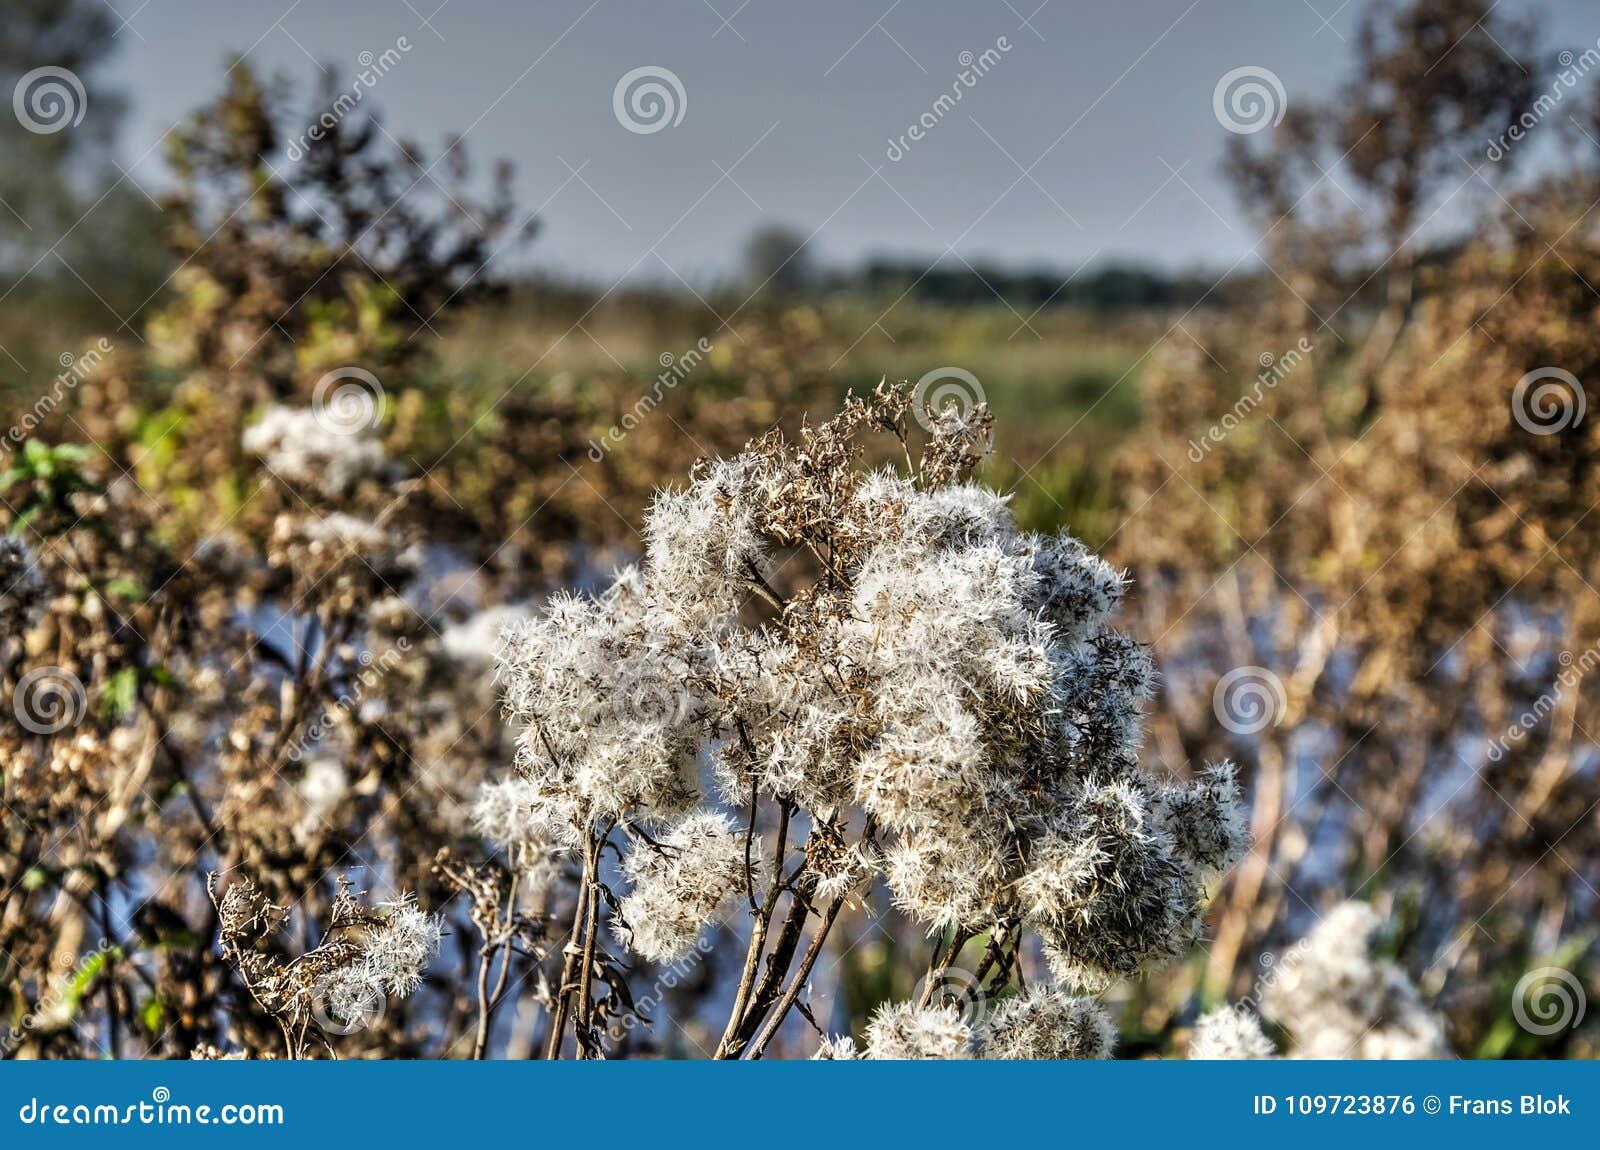 Fluffy white flowers in autumn stock photo image of field people fluffy white flowers in autumn mightylinksfo